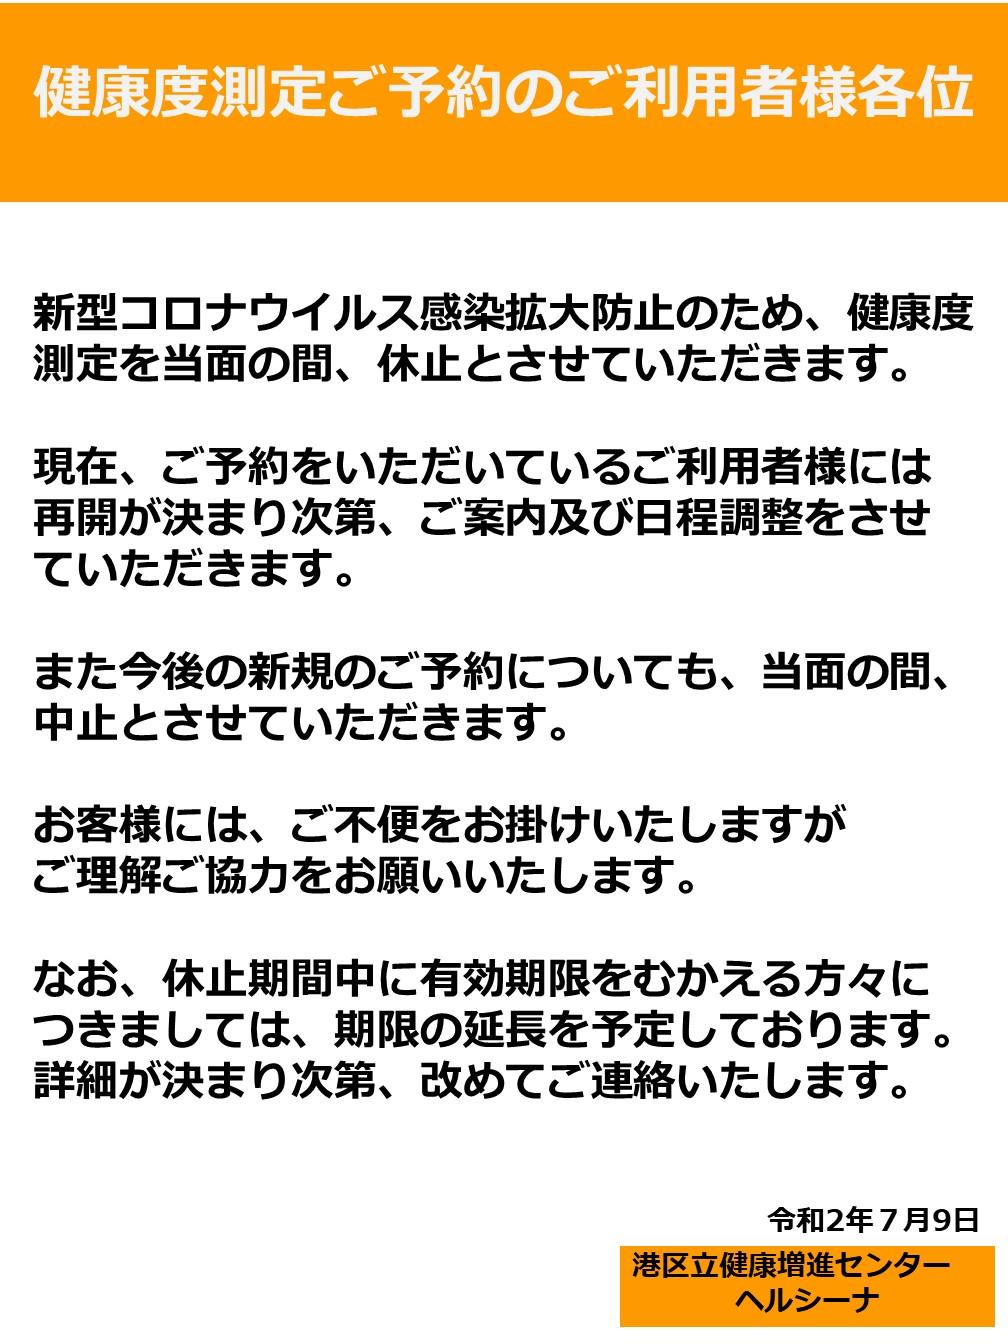 20200709健康度測定ポスター(修正済).jpg